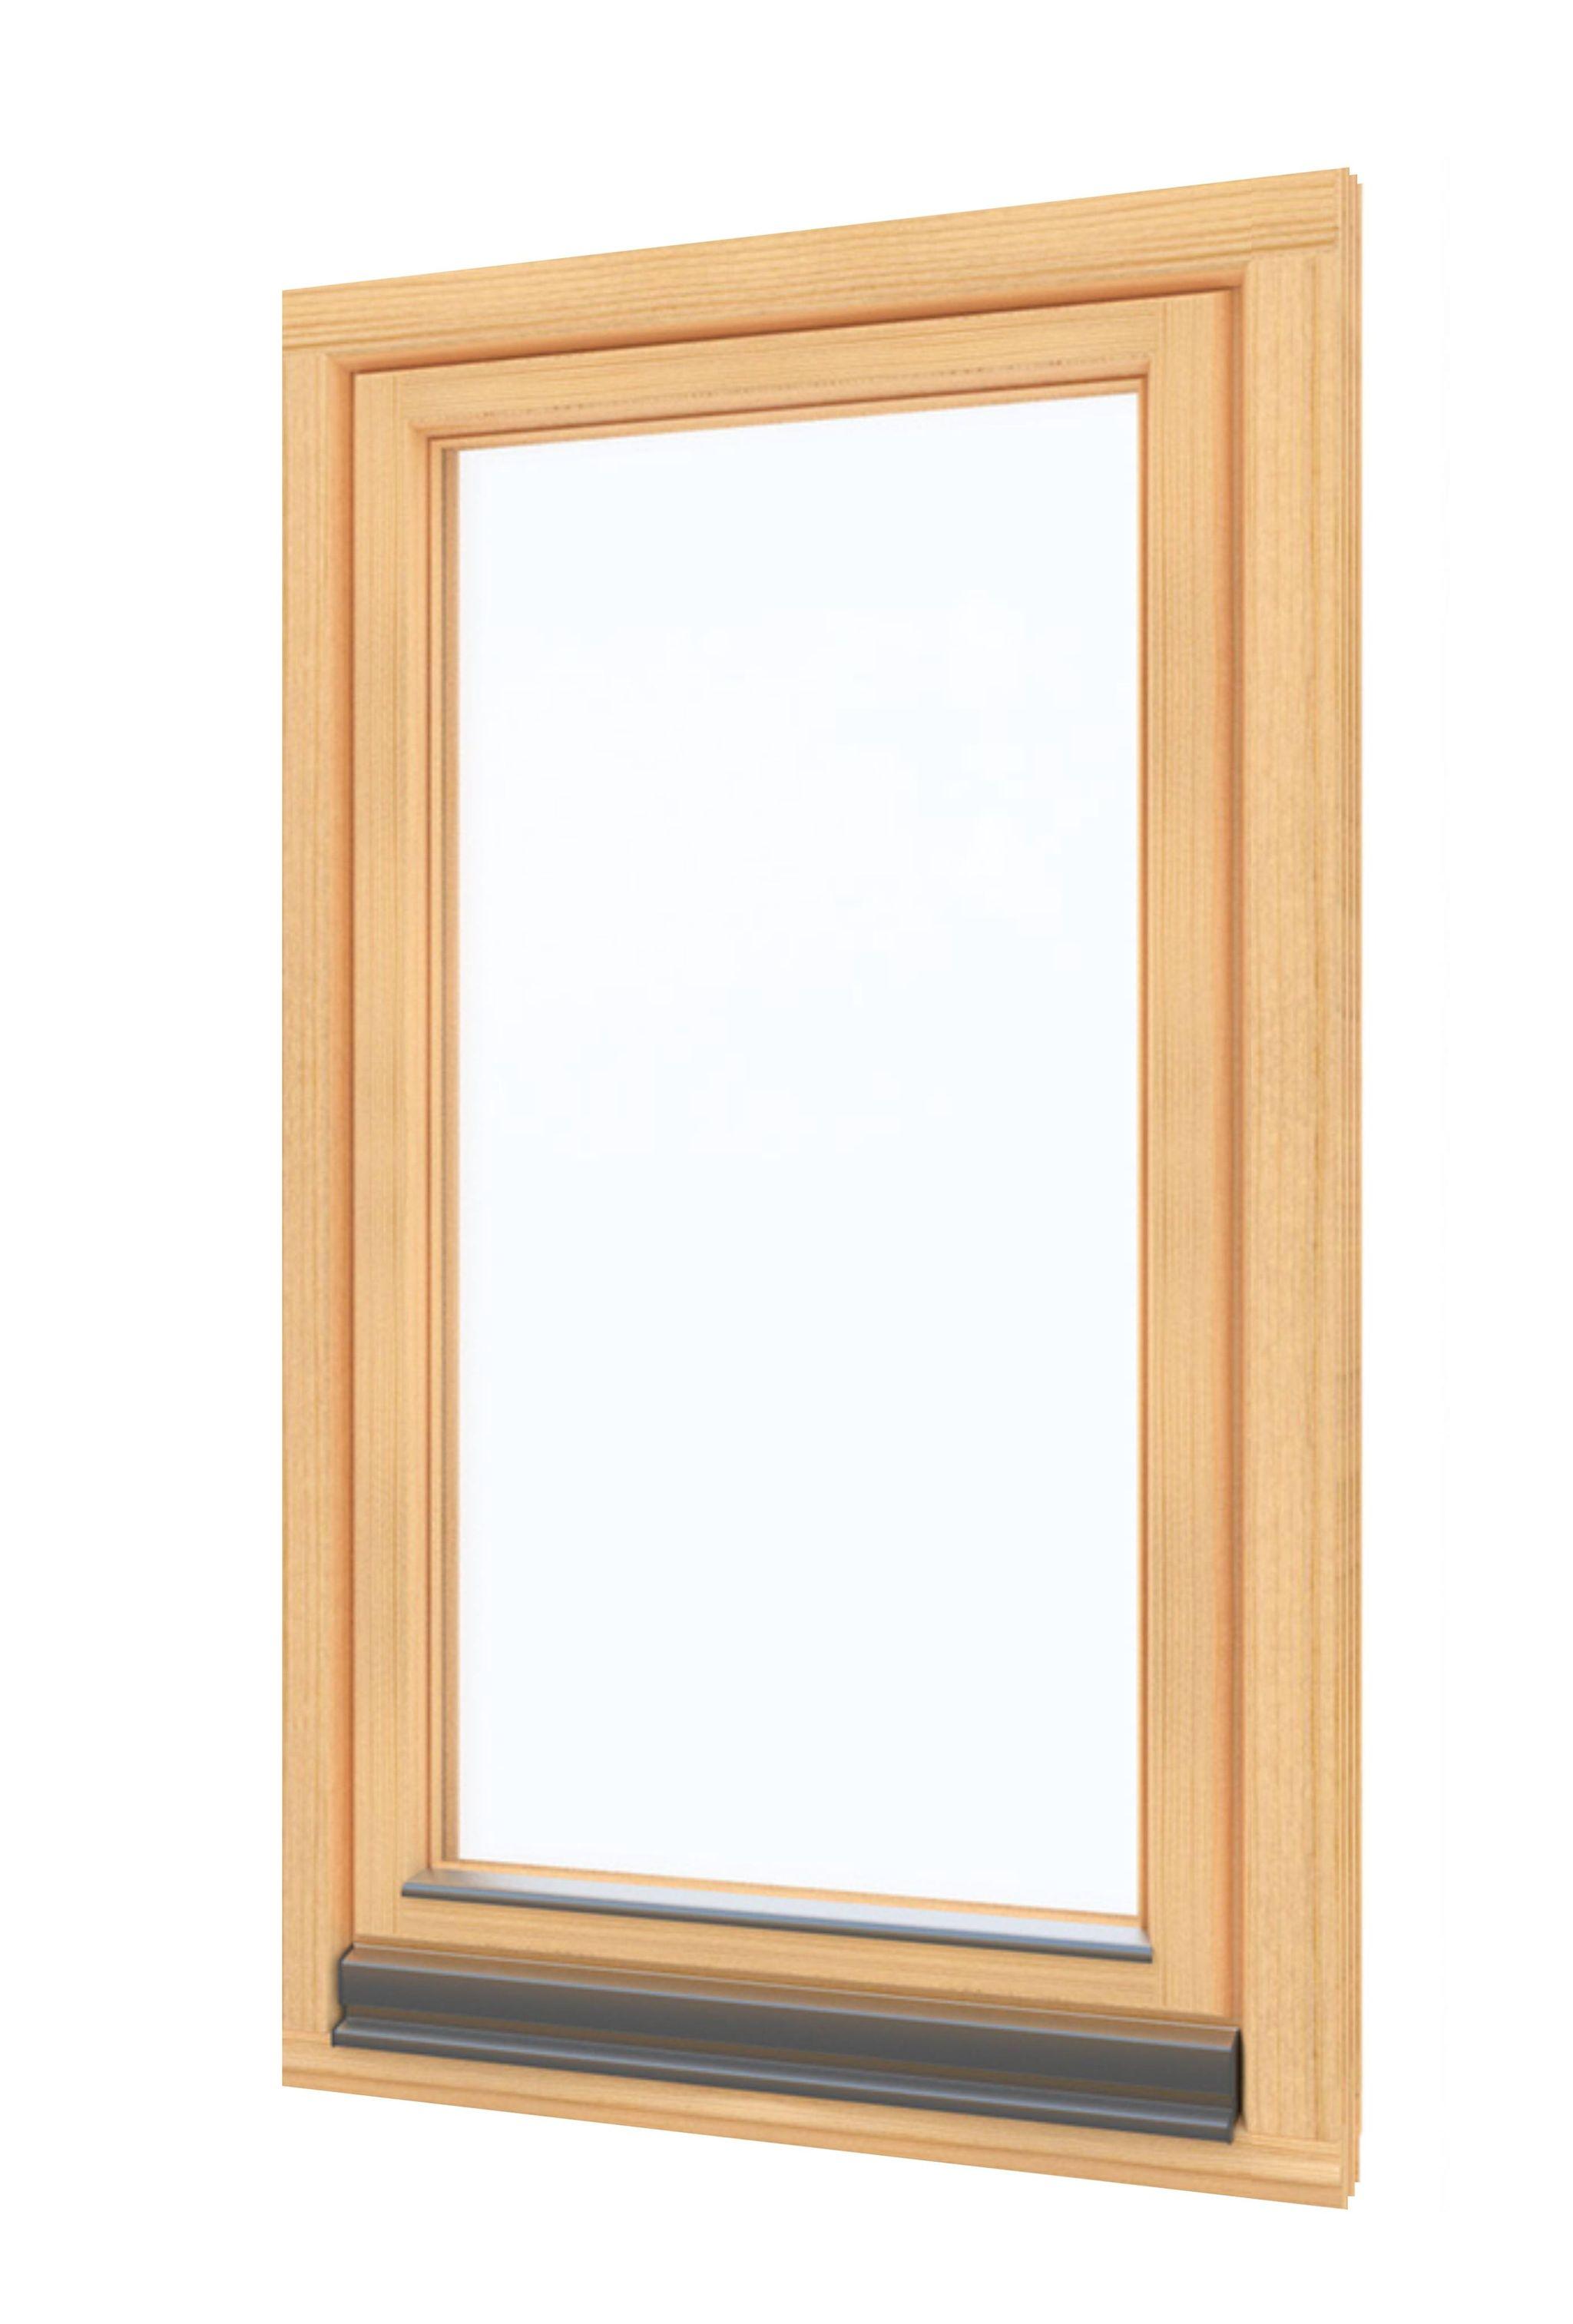 Okno SCHS 78 Integral